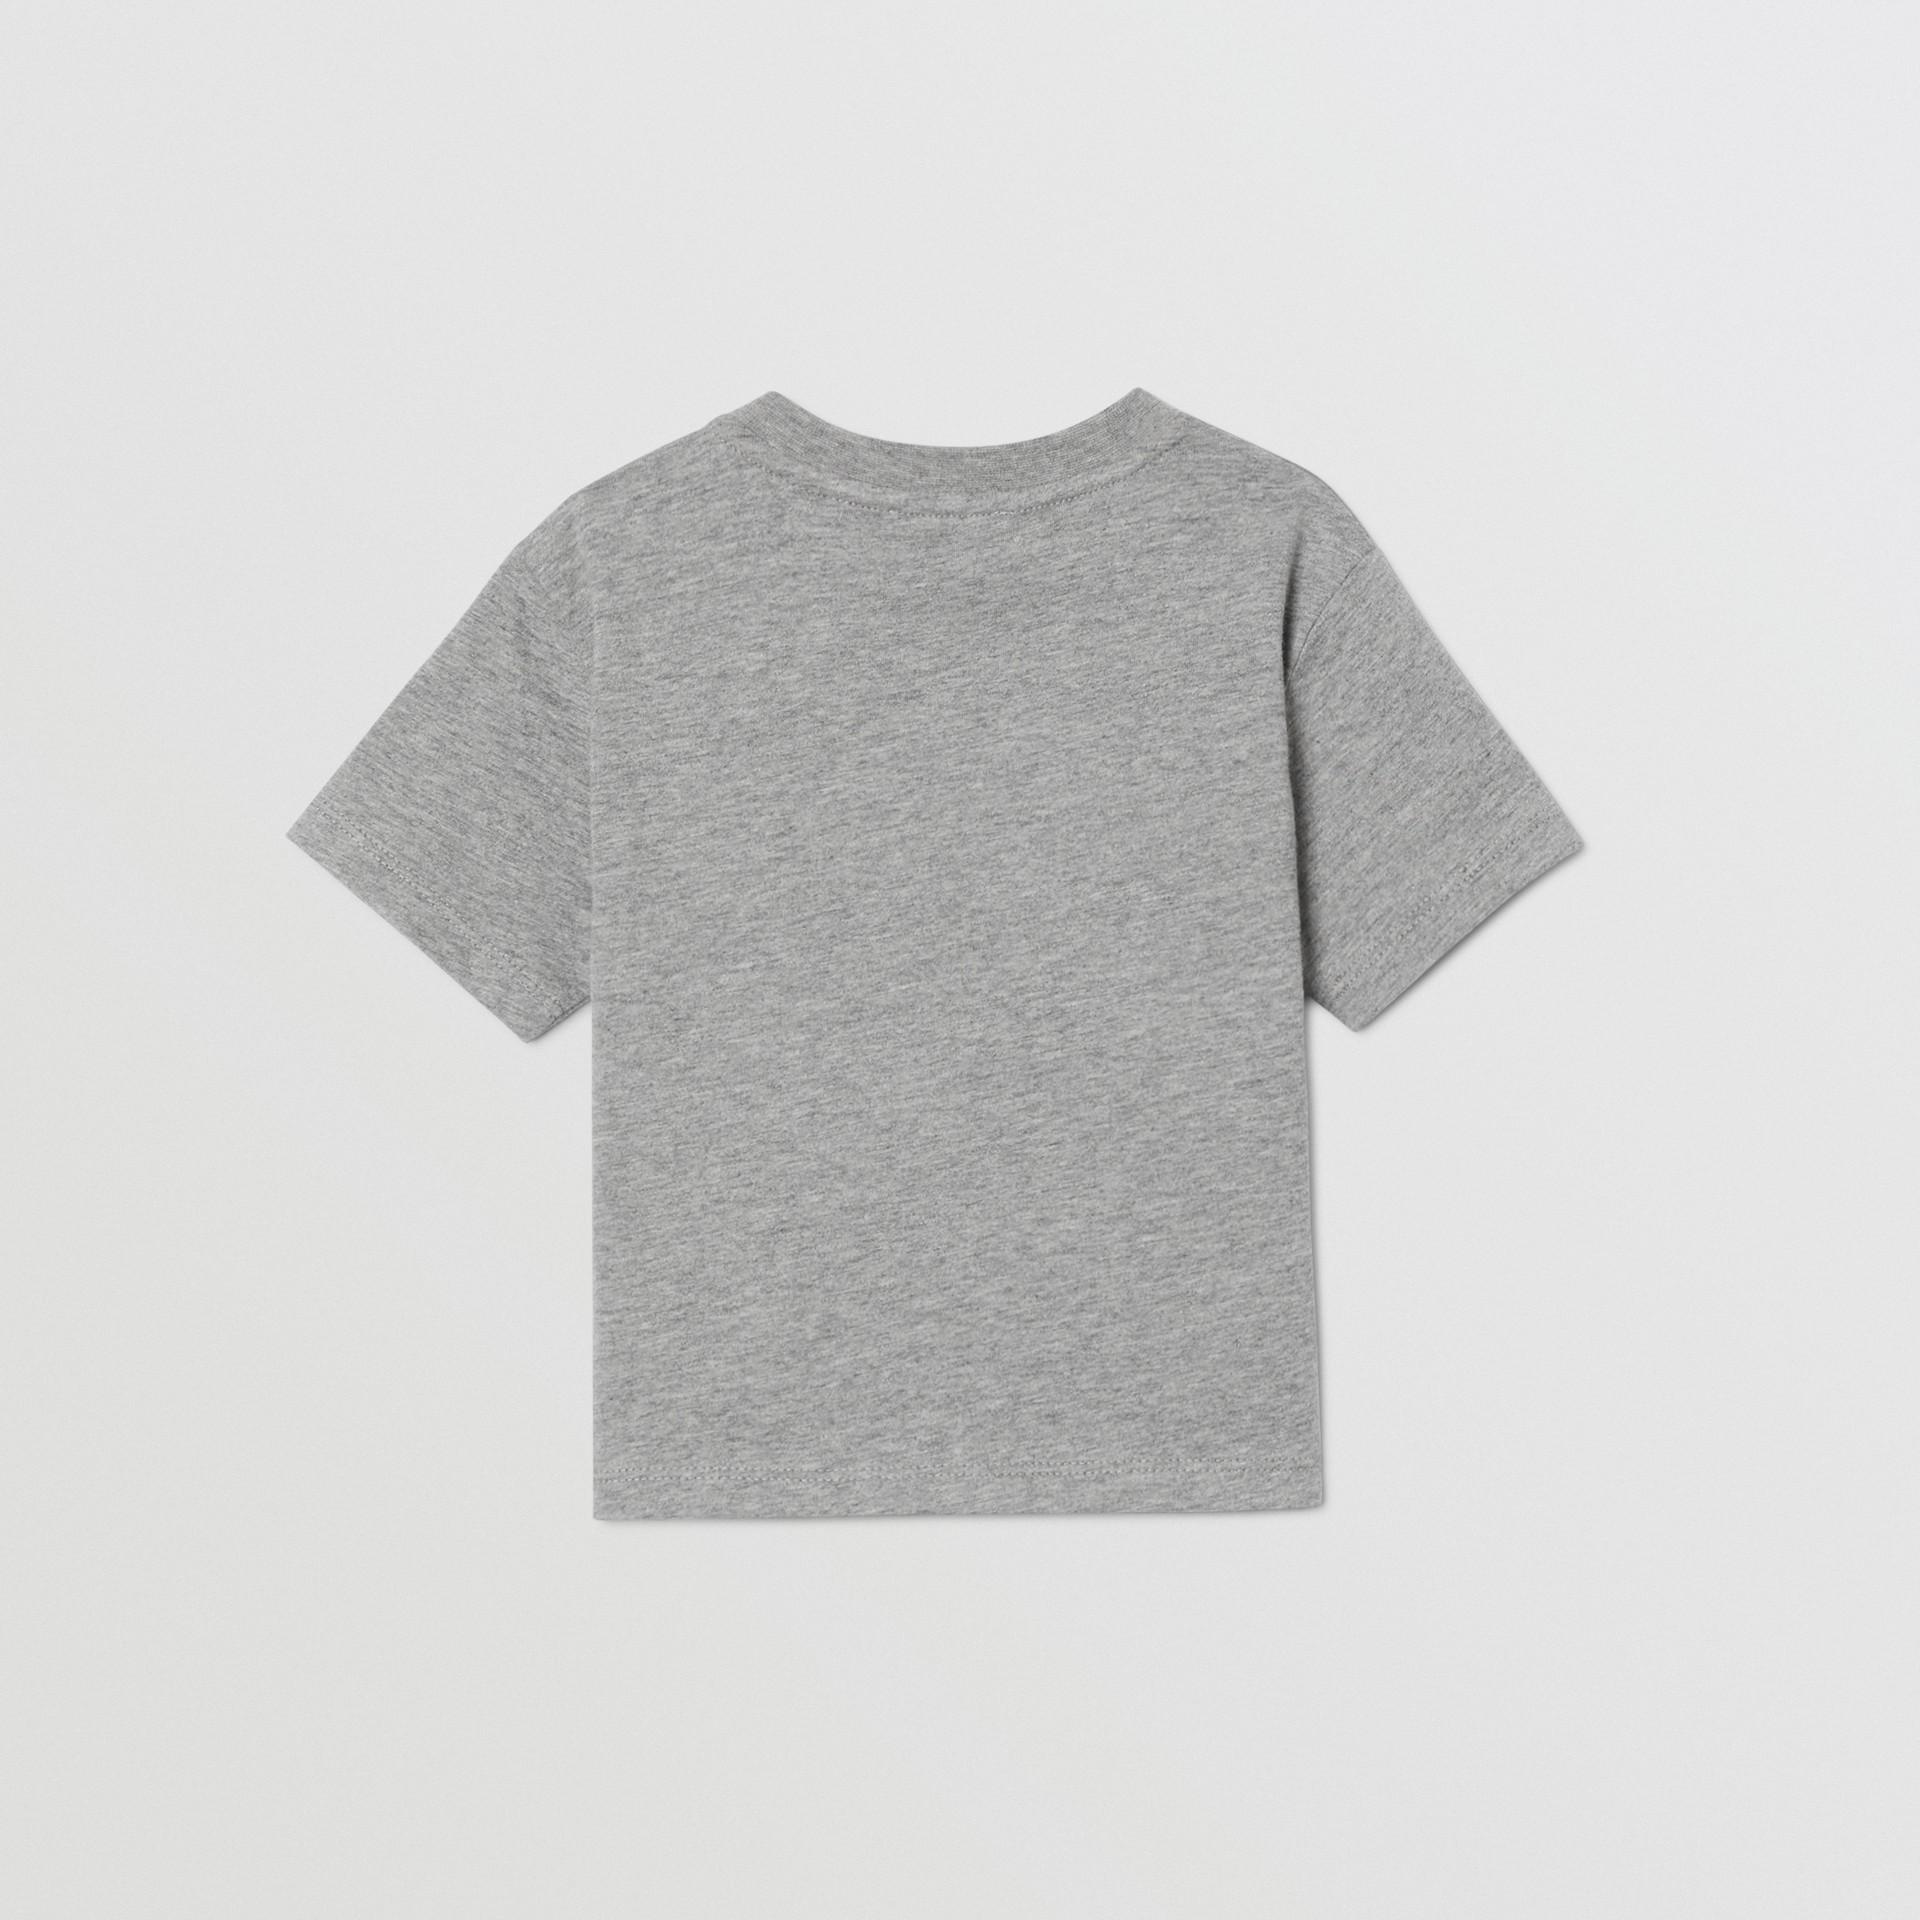 Logo Print Cotton T-shirt in Grey Melange - Children | Burberry - gallery image 4